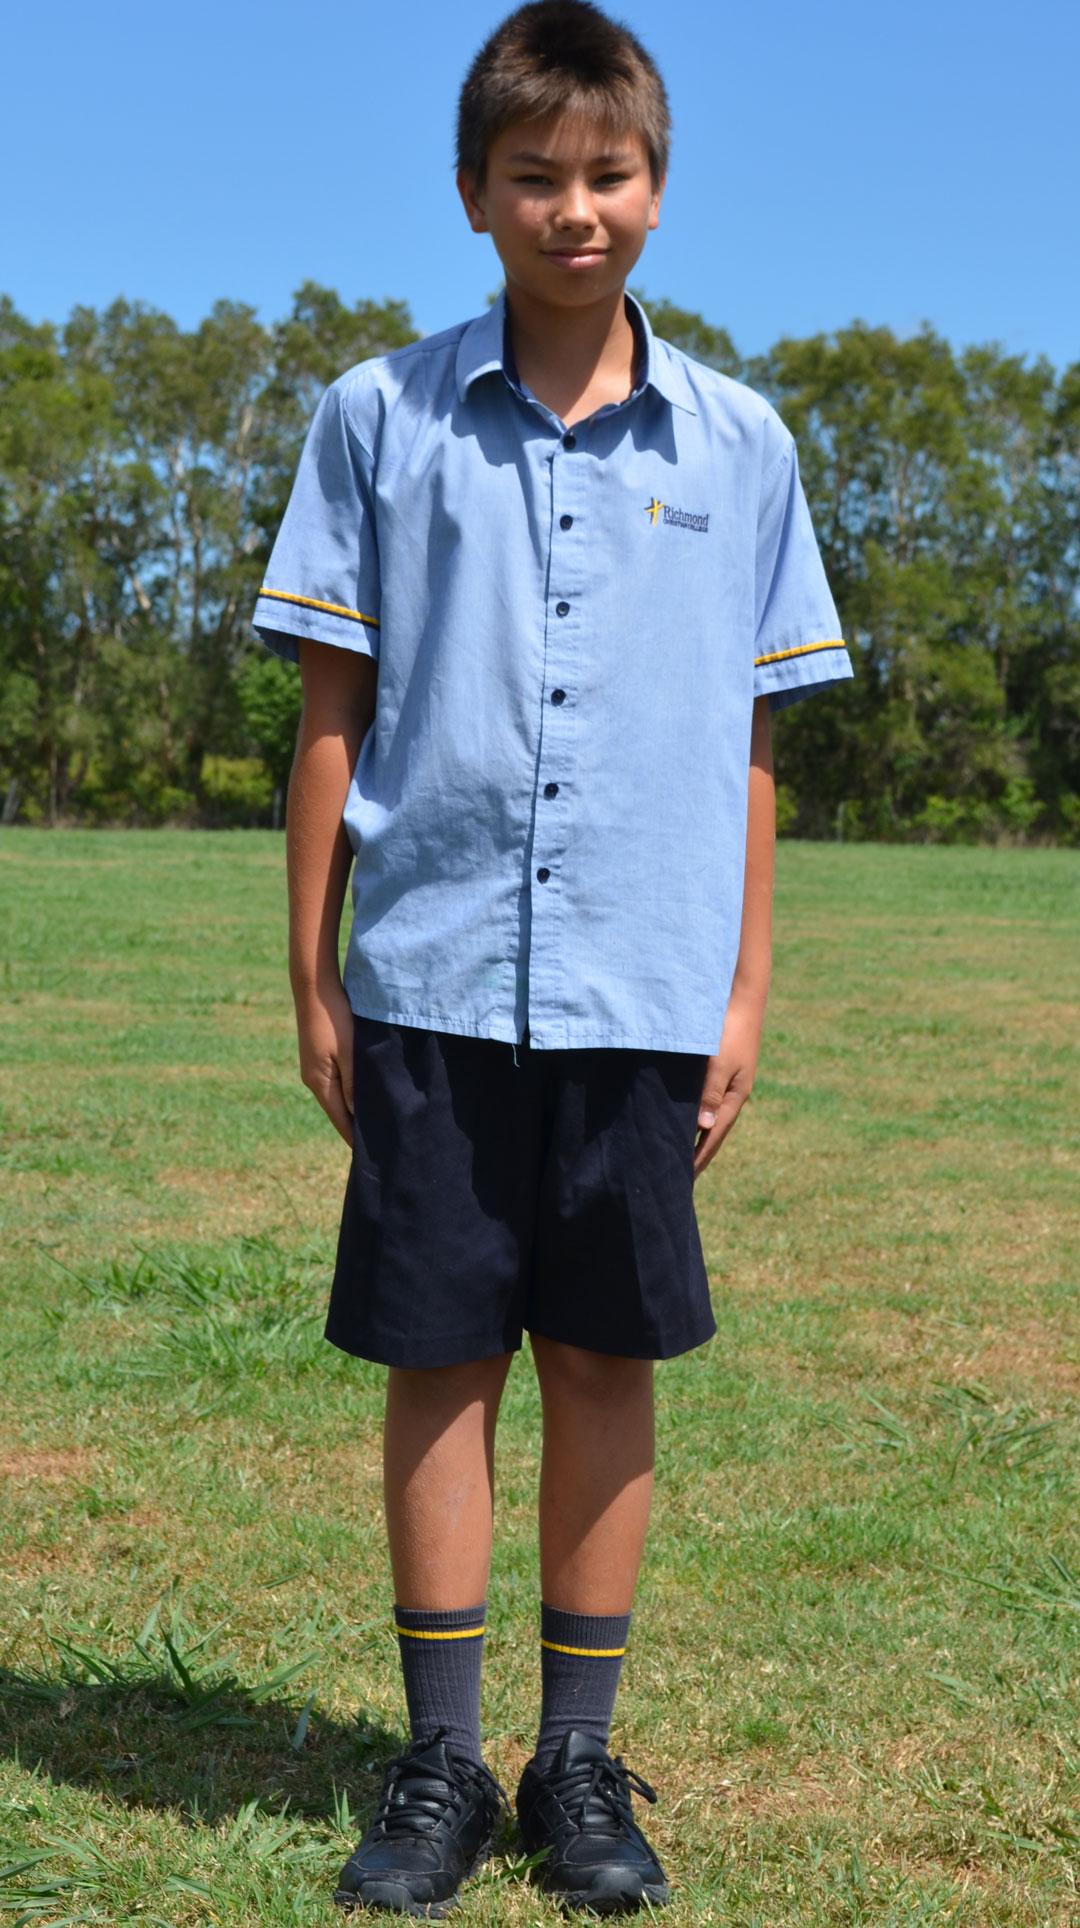 highschoolboy